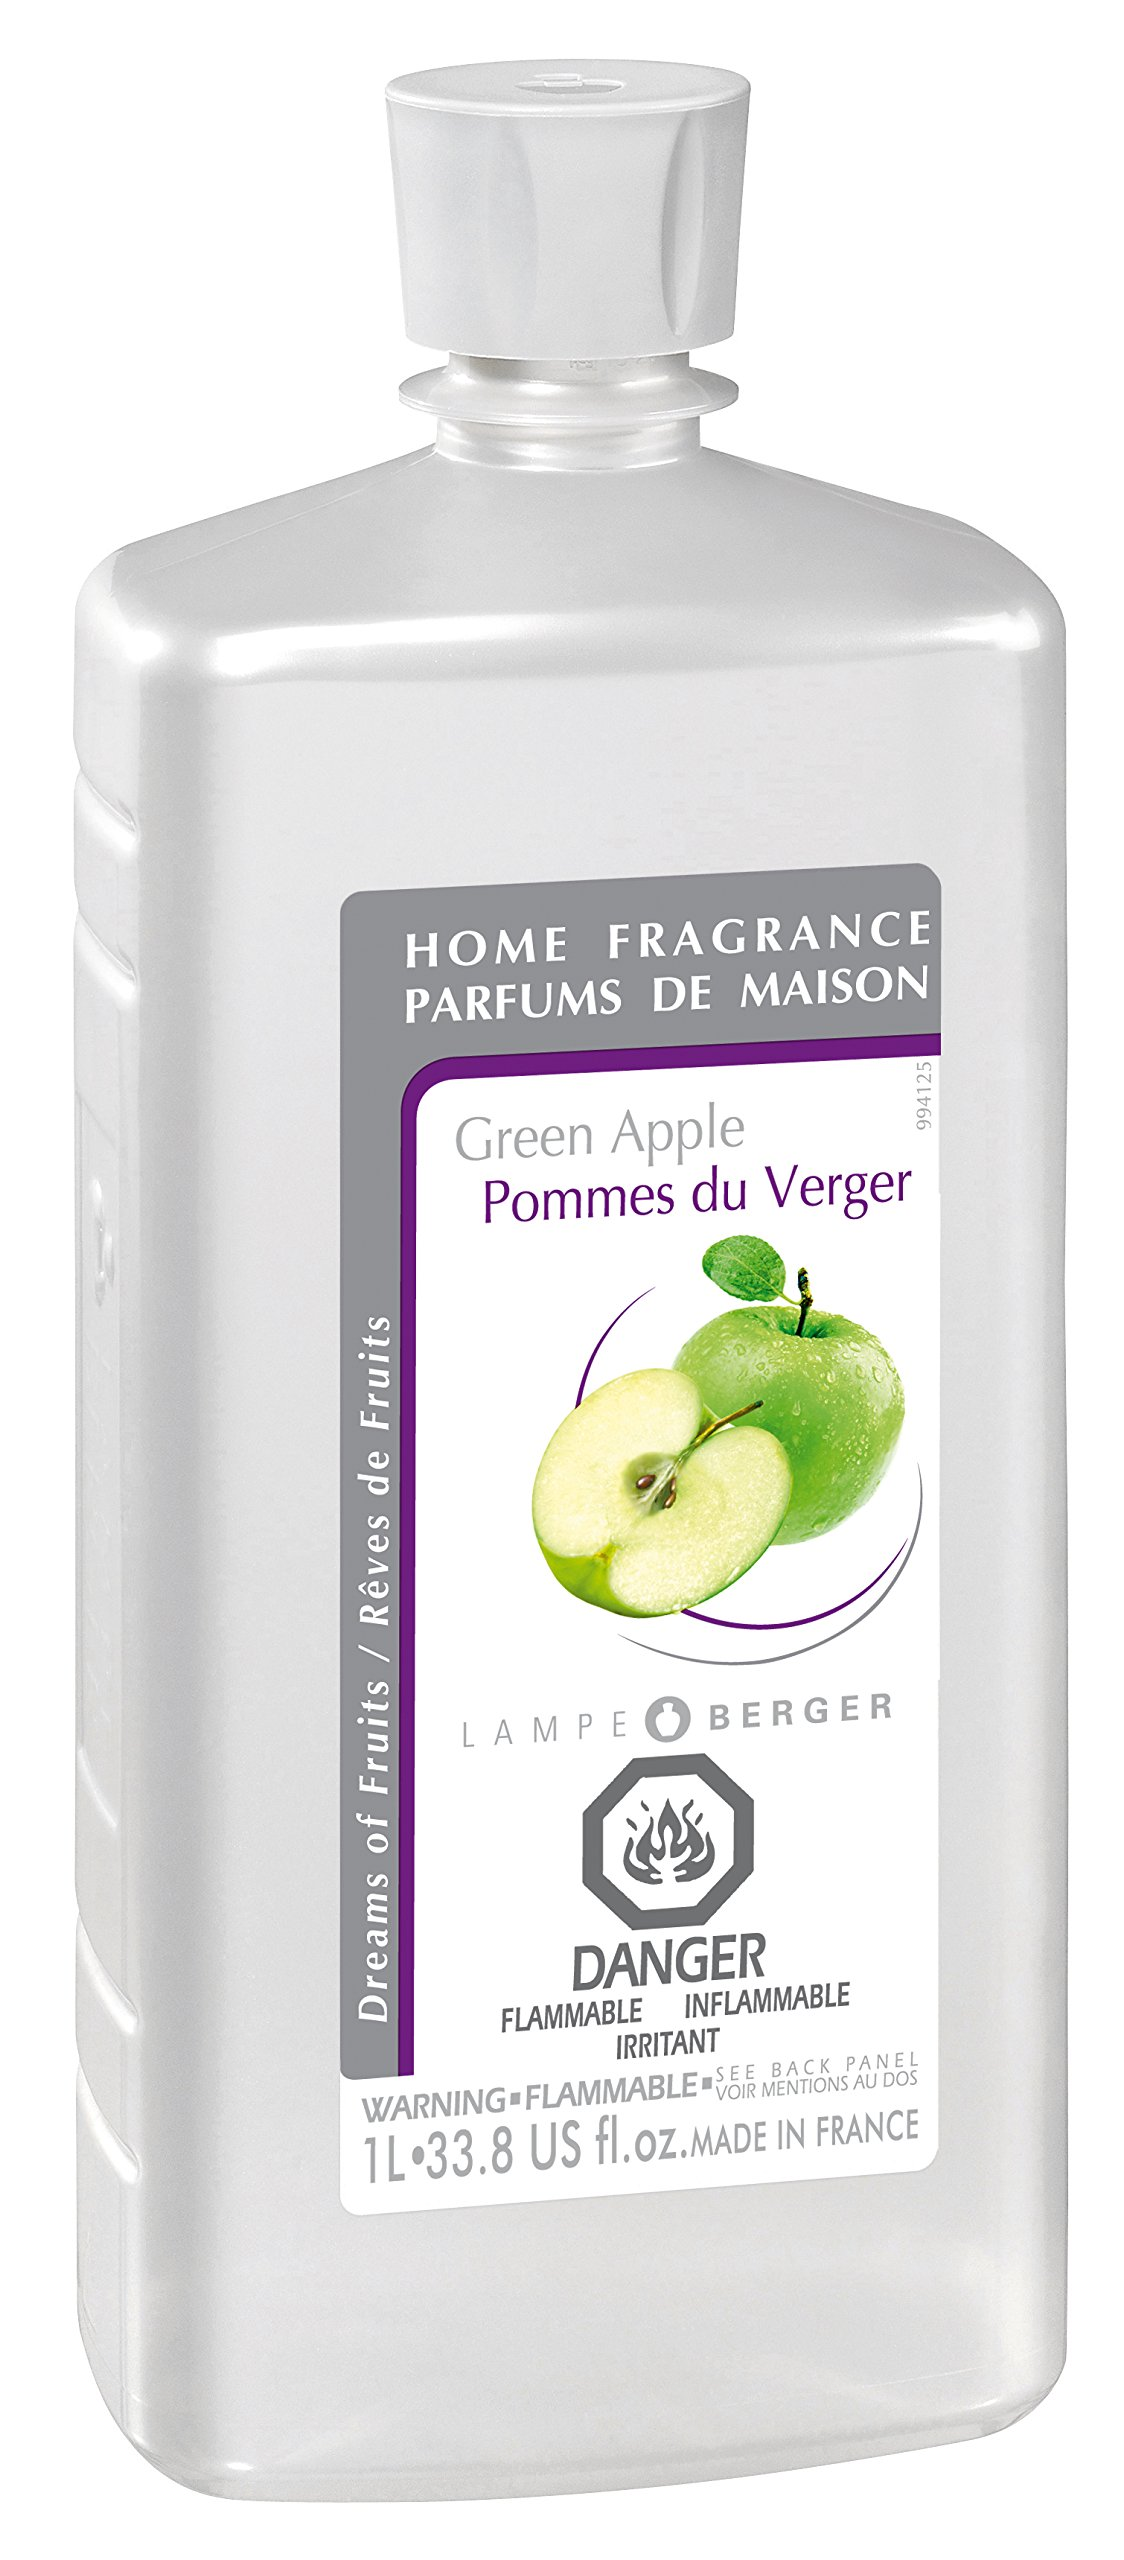 Lampe Berger Fragrance, 33.8 Fluid Ounce, Green Apple